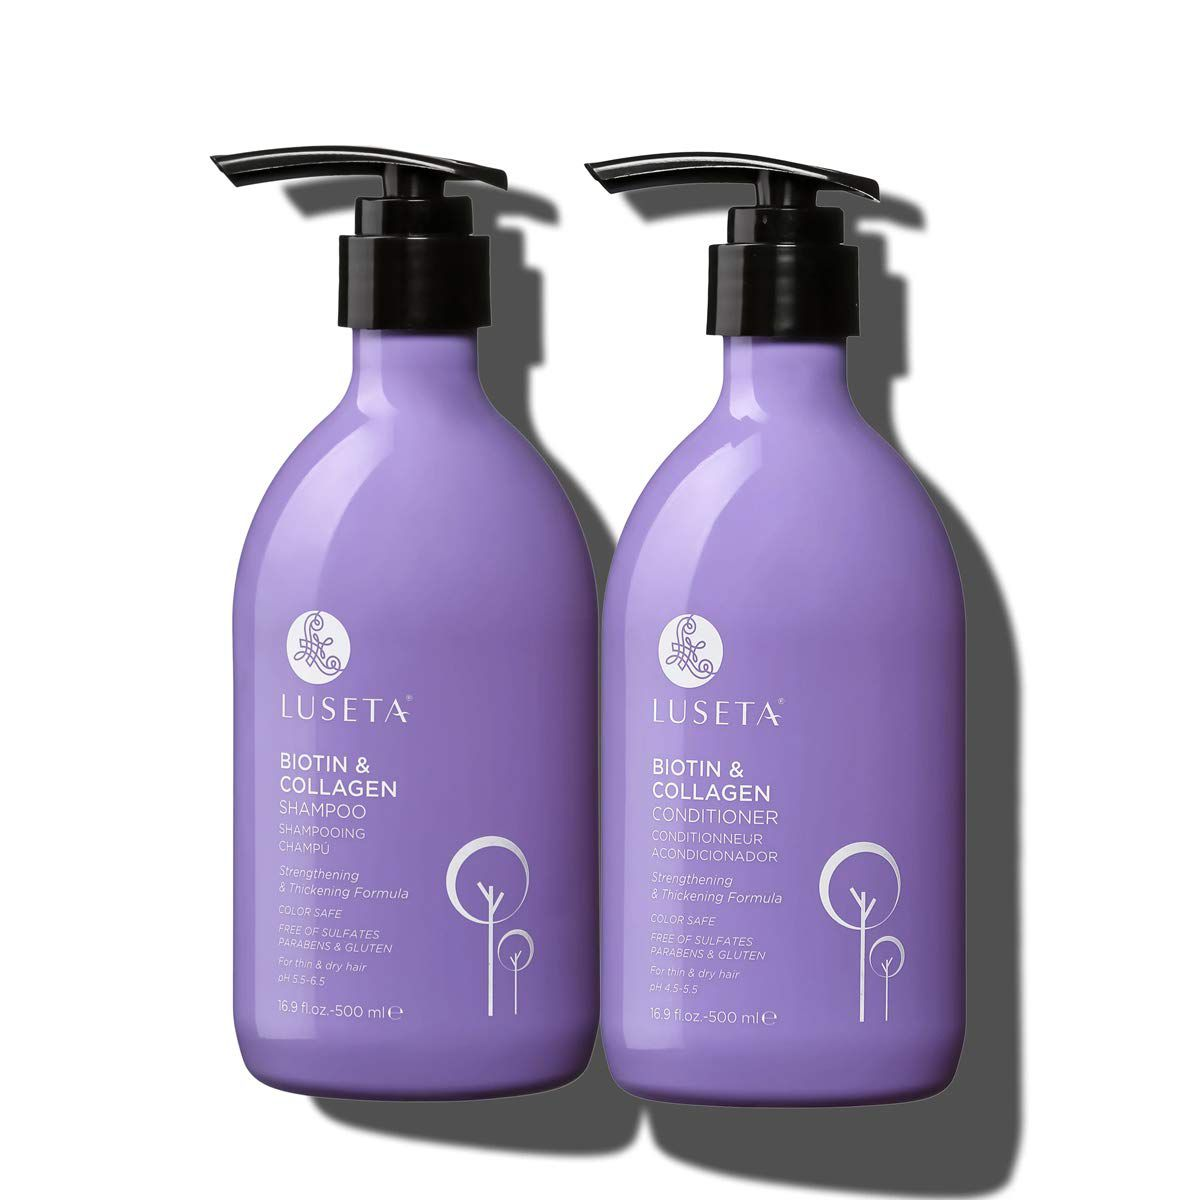 Luseta Biotin & Collagen Shampoo & Conditioner Set